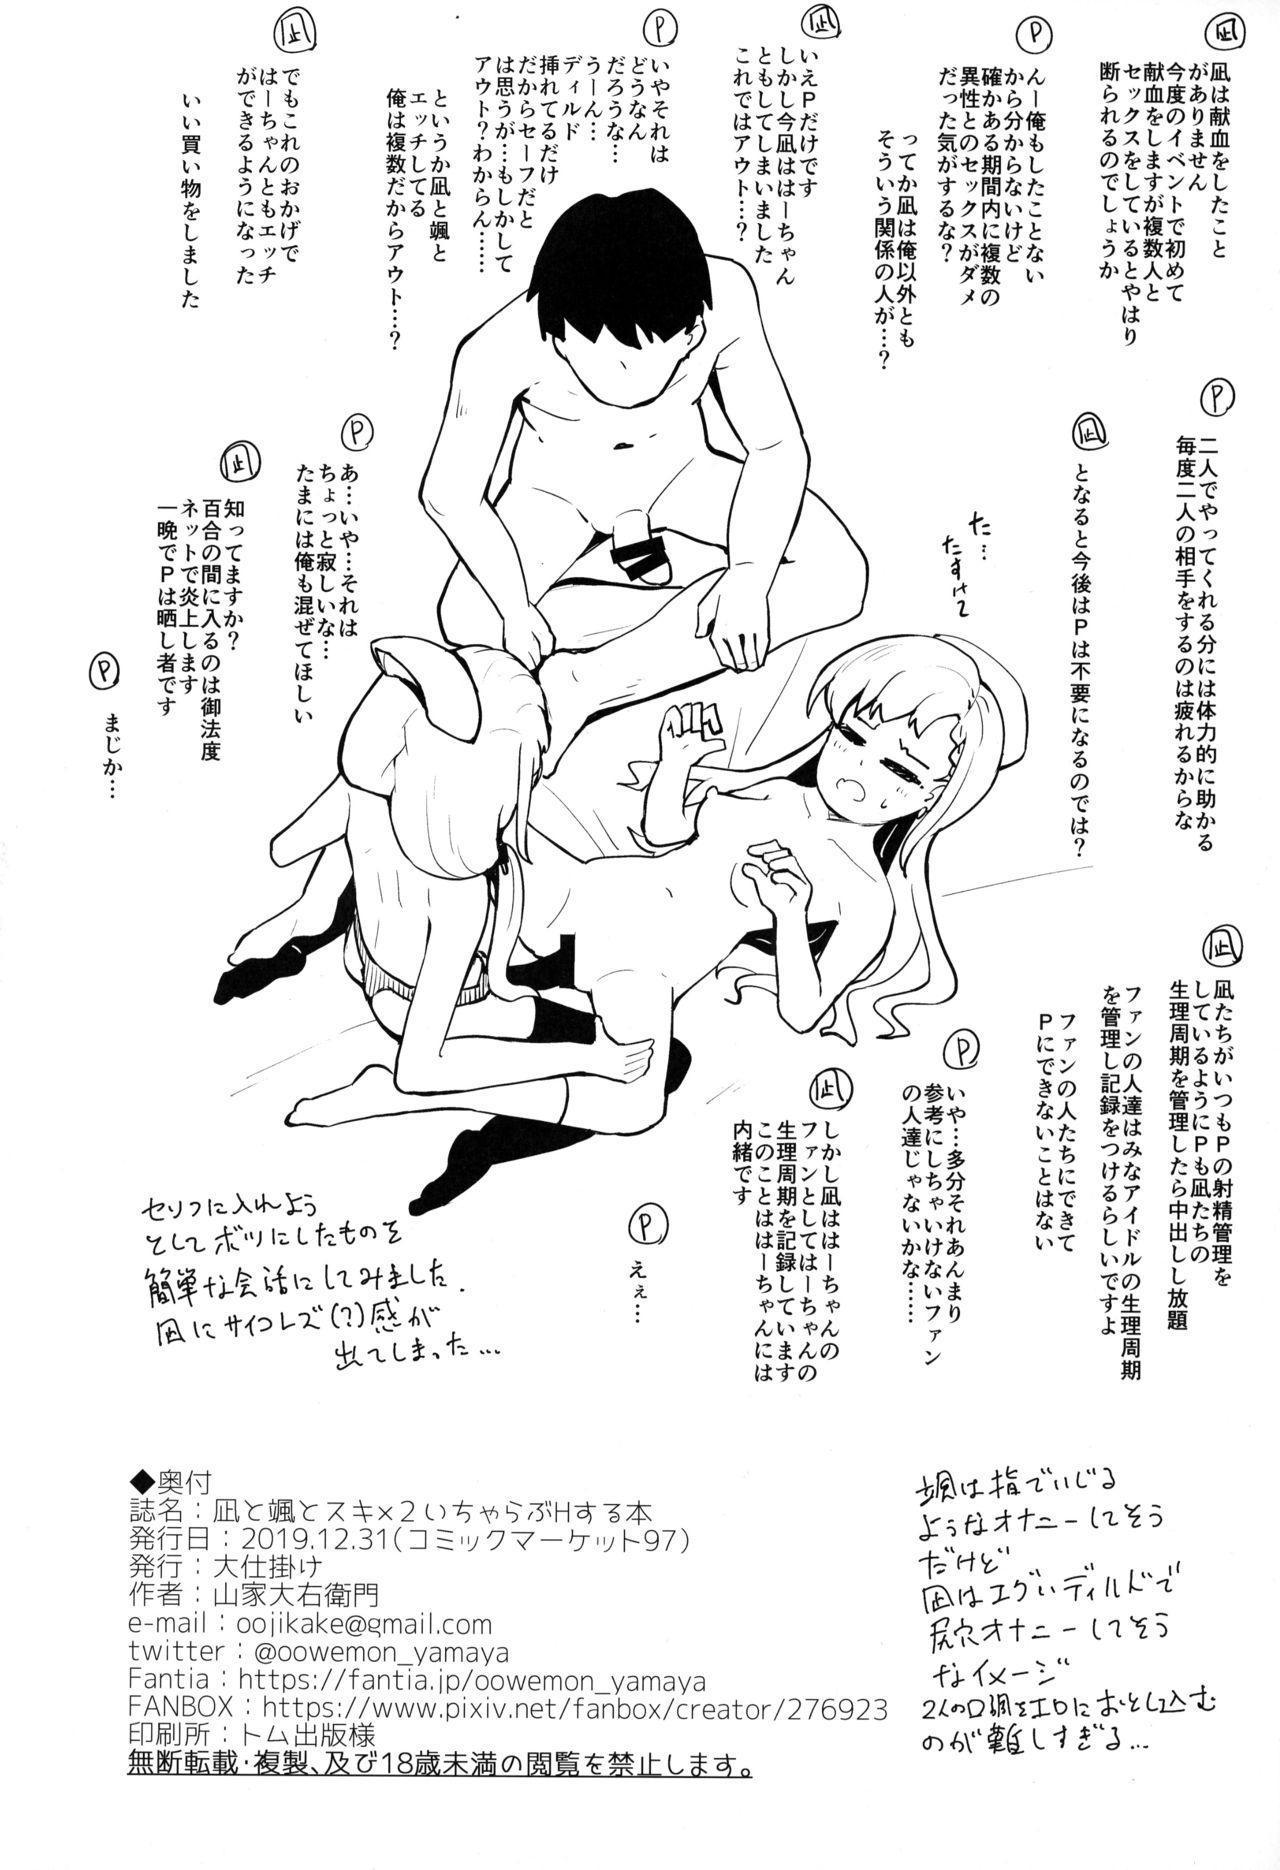 Nagi to Hayate to Suki x2 Icha Love H Suru Hon 20